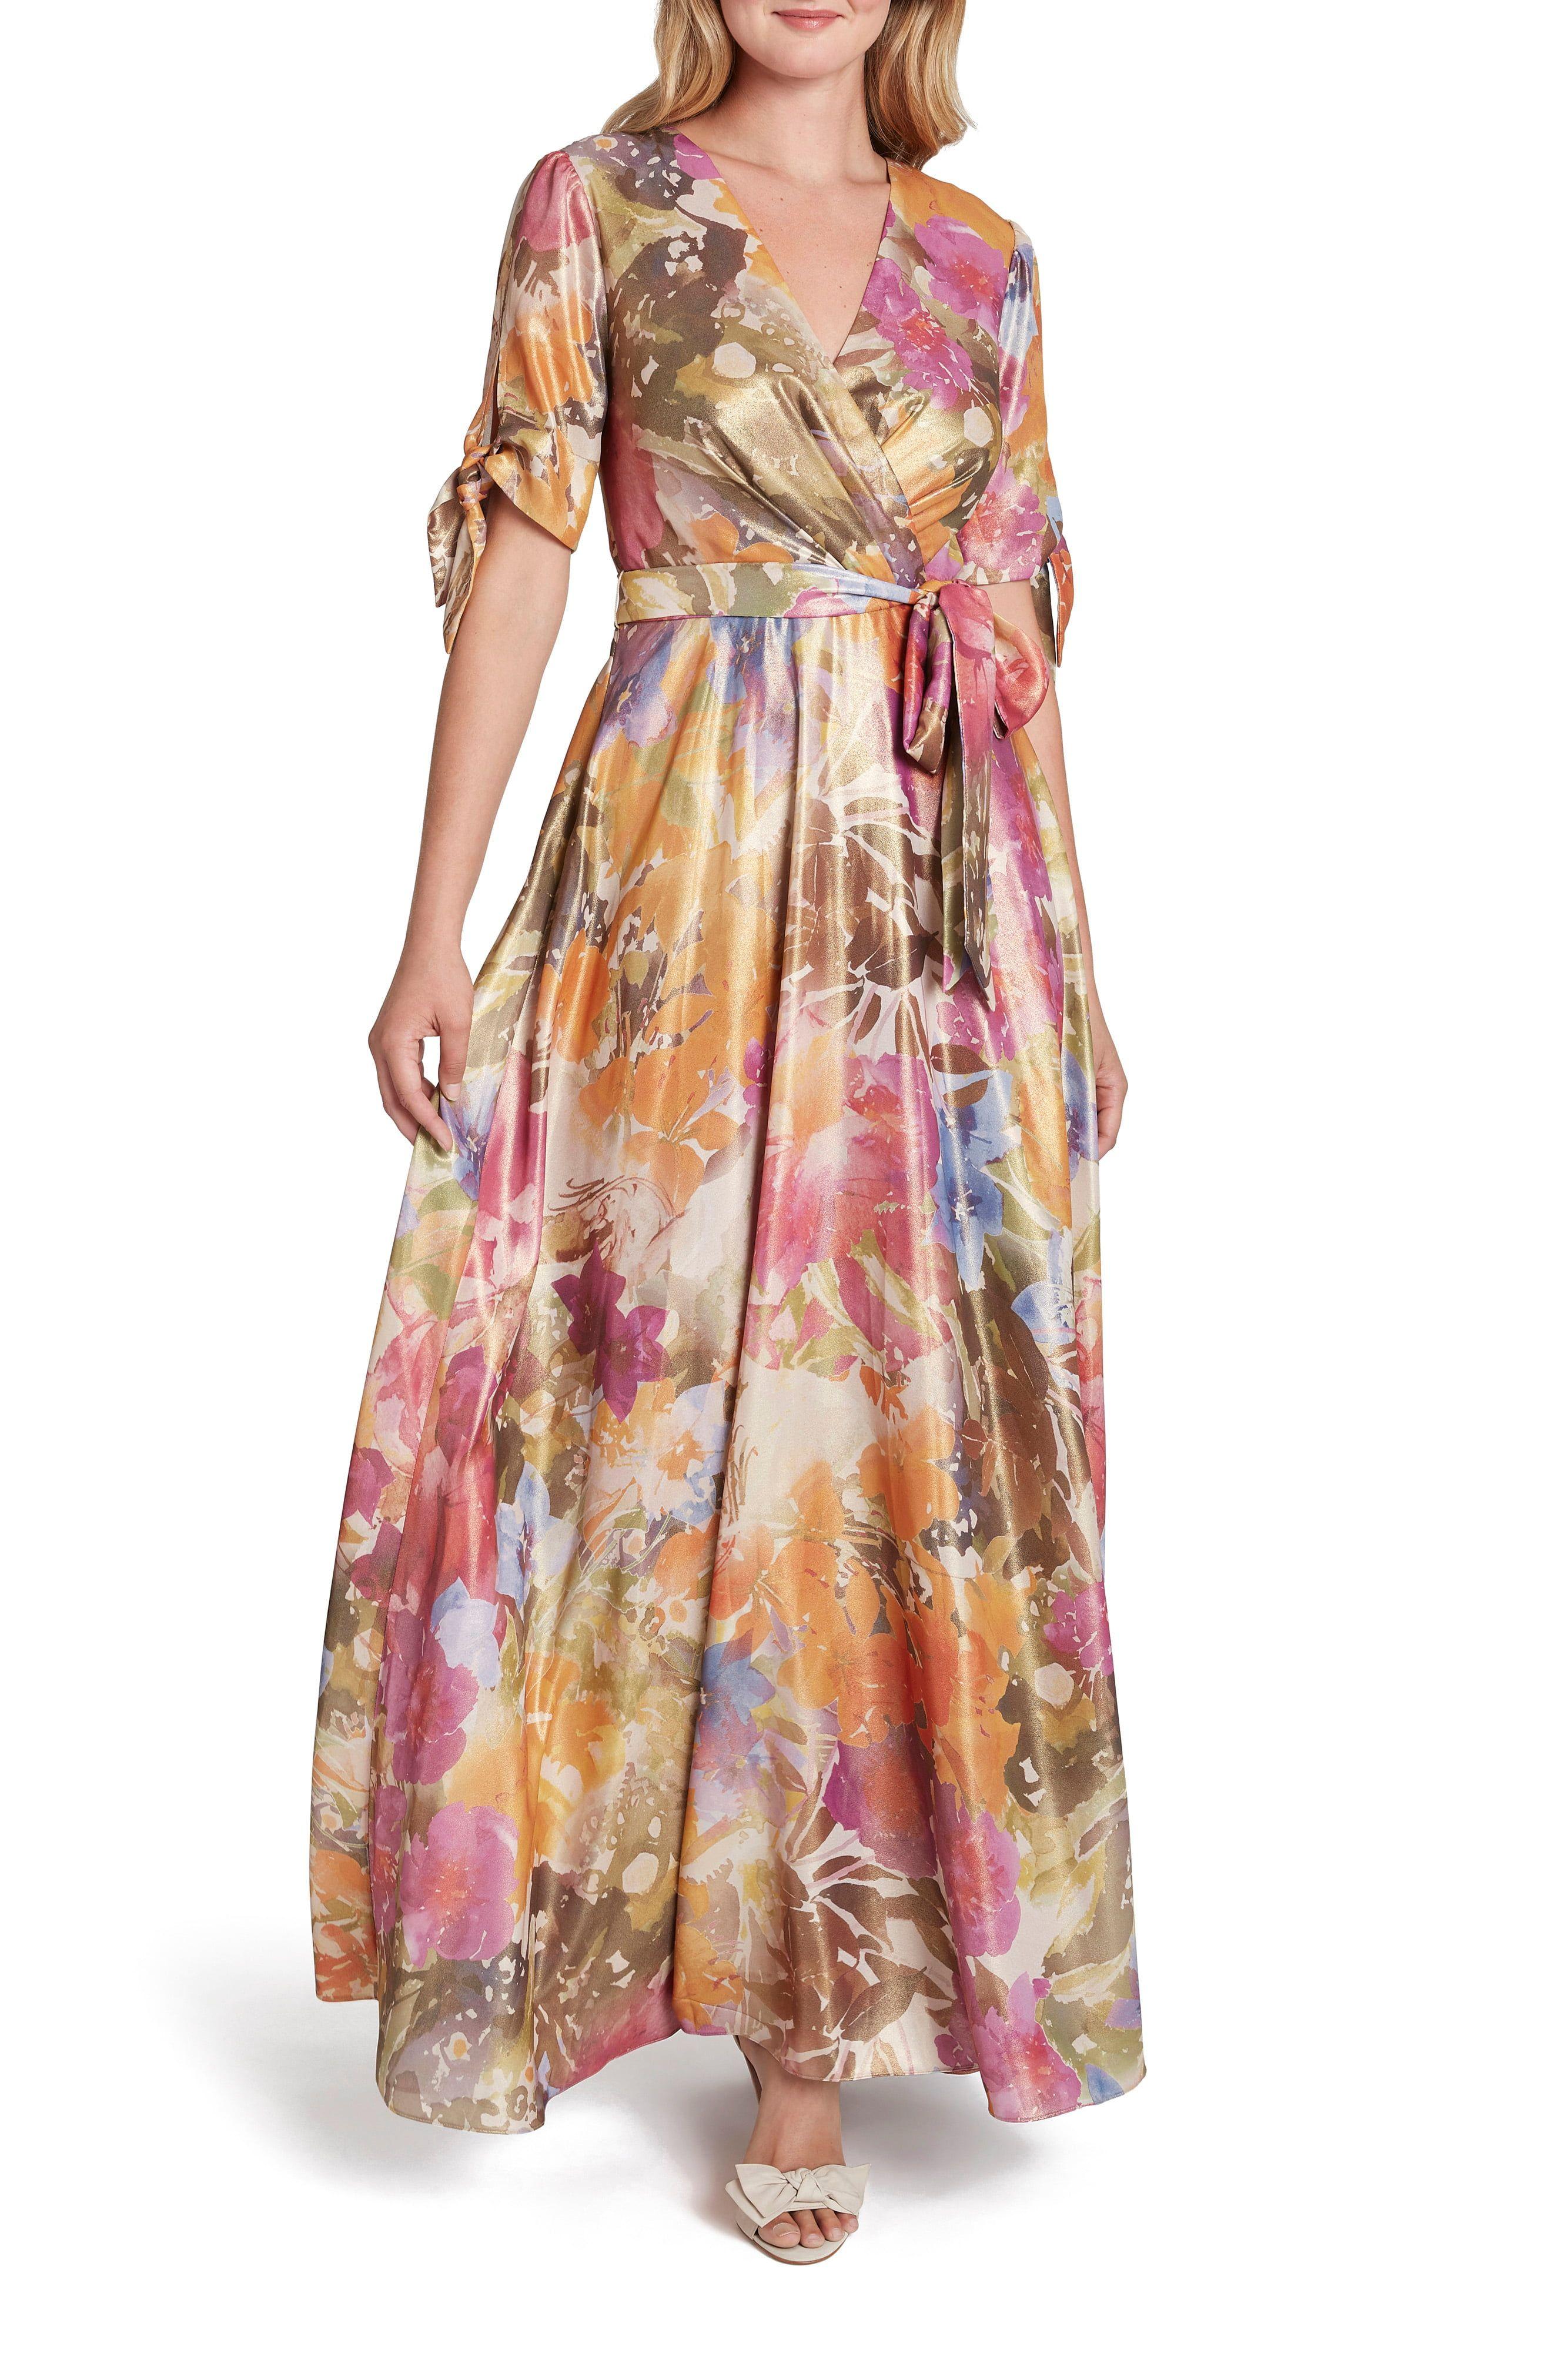 Tahari Floral Shimmer Short Sleeve Gown Nordstrom Maxi Dress Elie Tahari Dresses Tahari Dress [ 4048 x 2640 Pixel ]